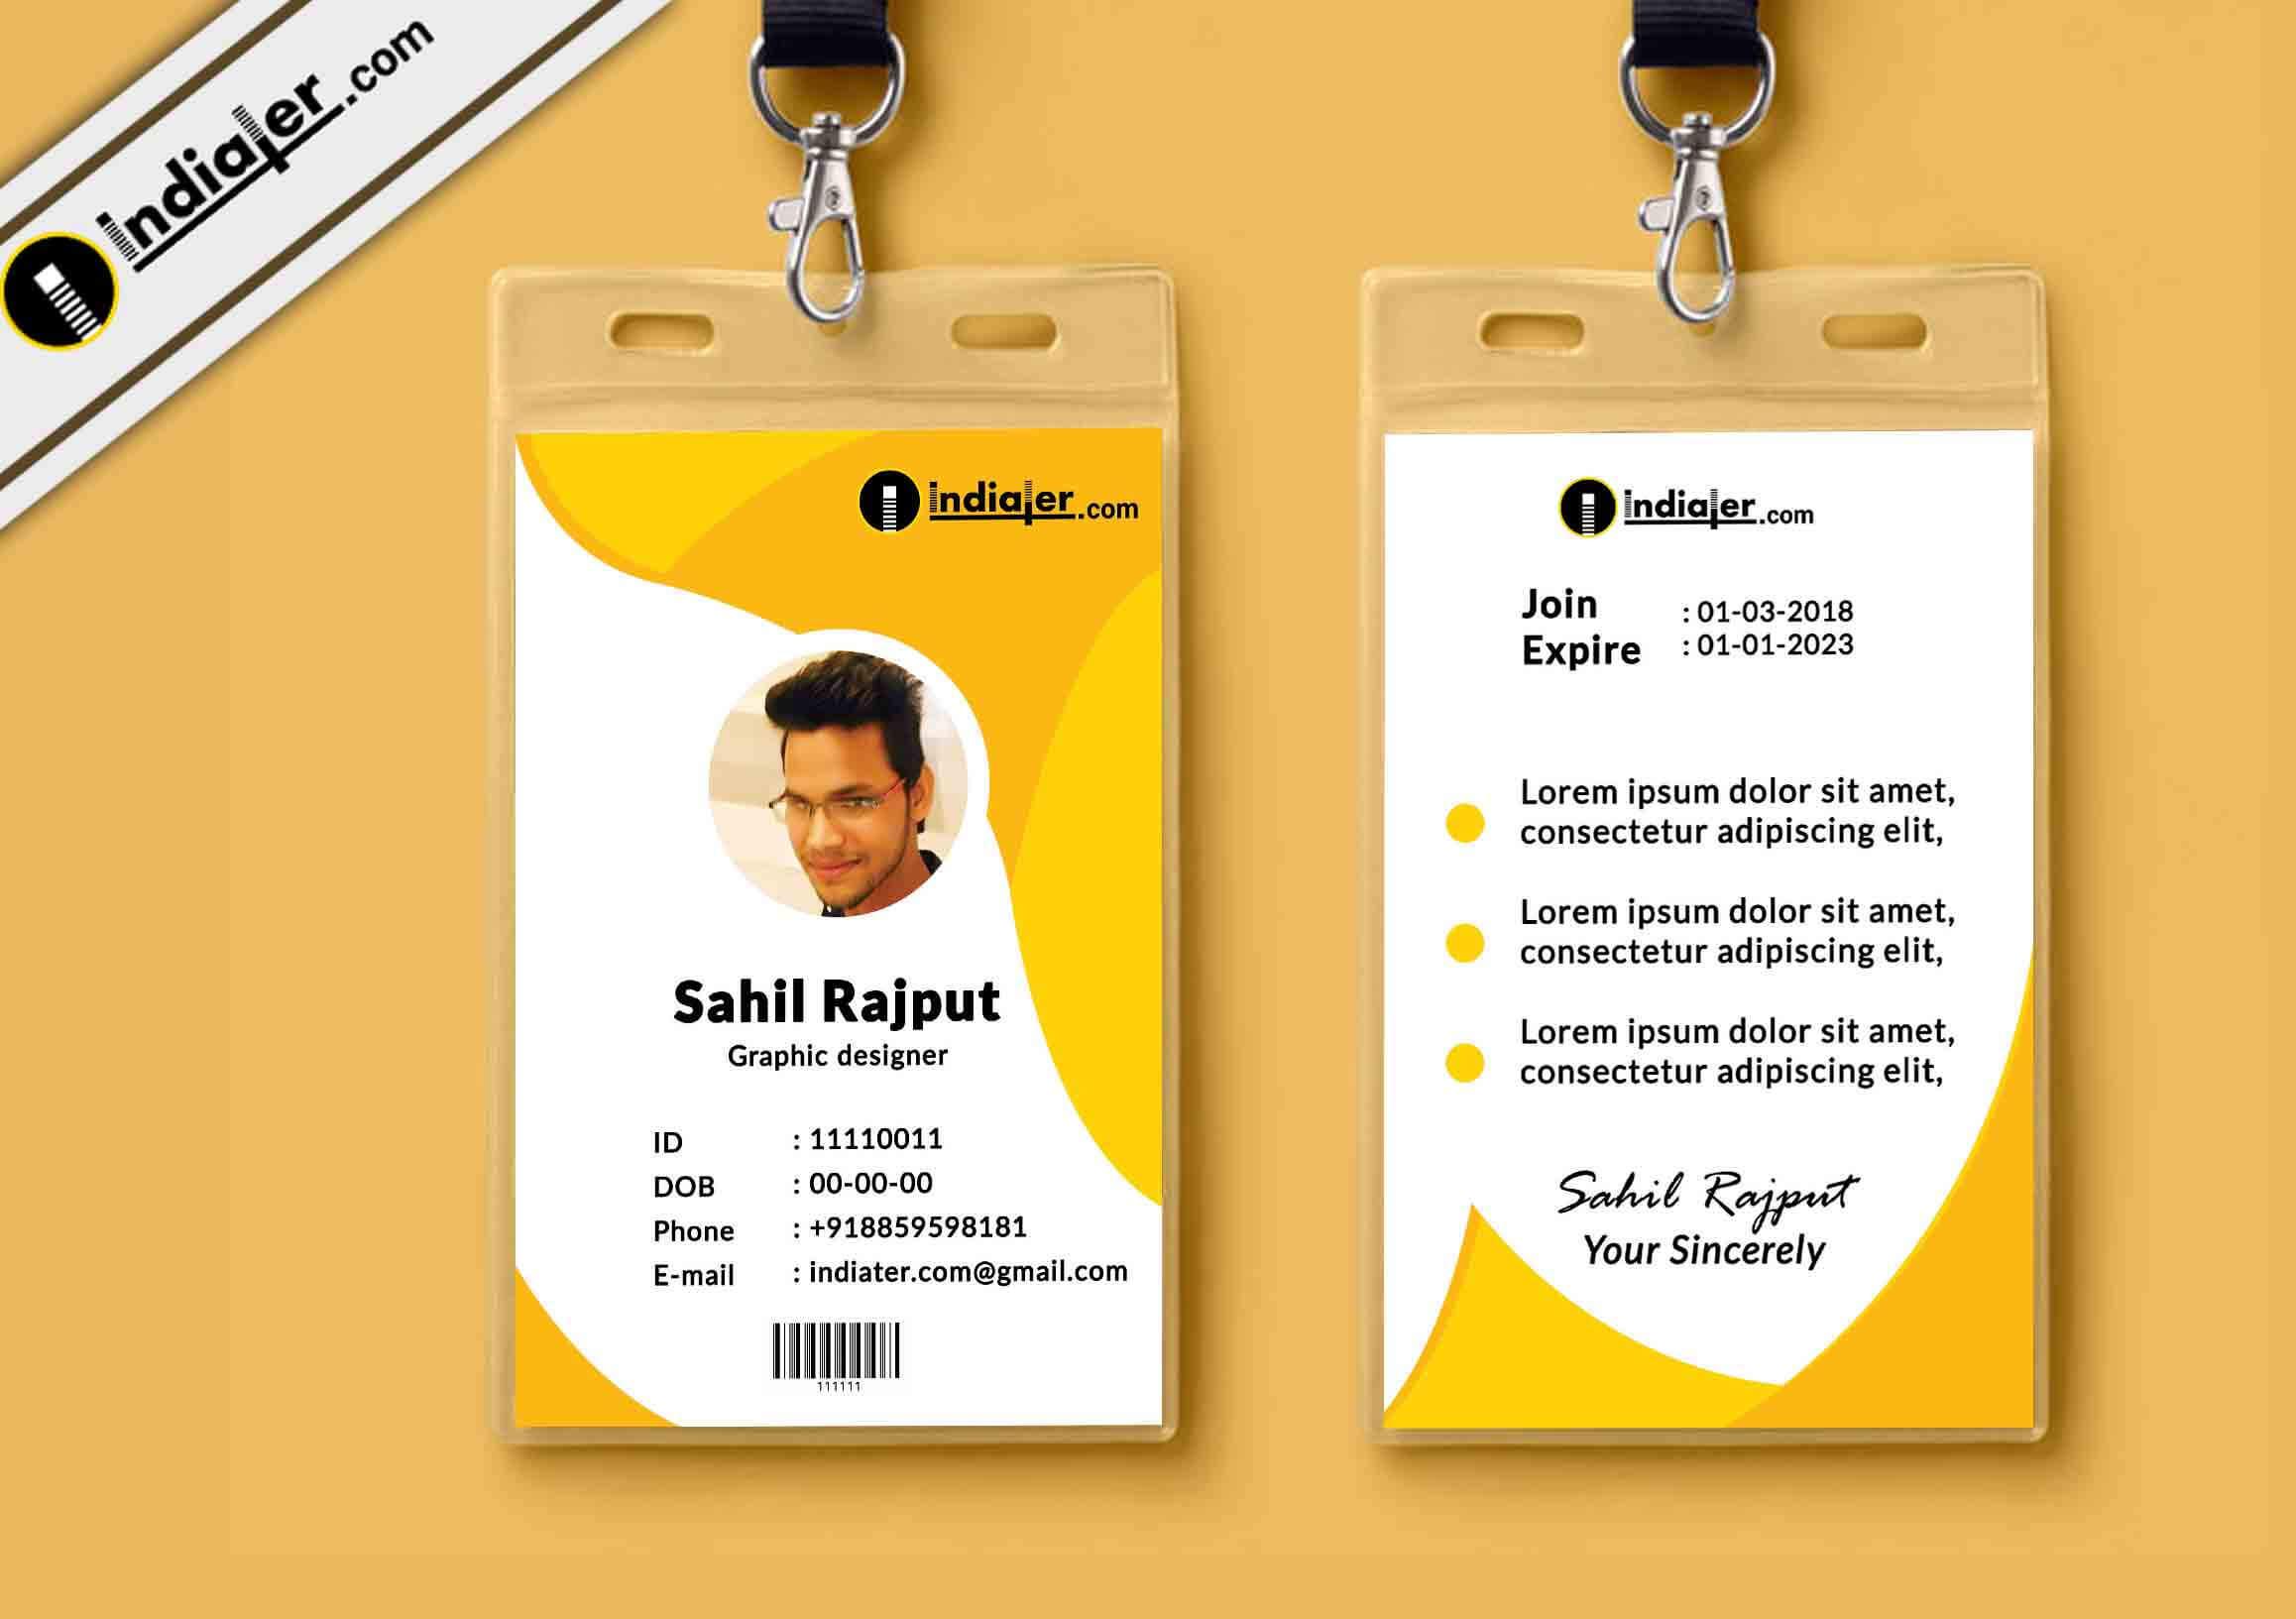 019 Id Card Template Psd Free Download Ideas Multipurpose Regarding College Id Card Template Psd